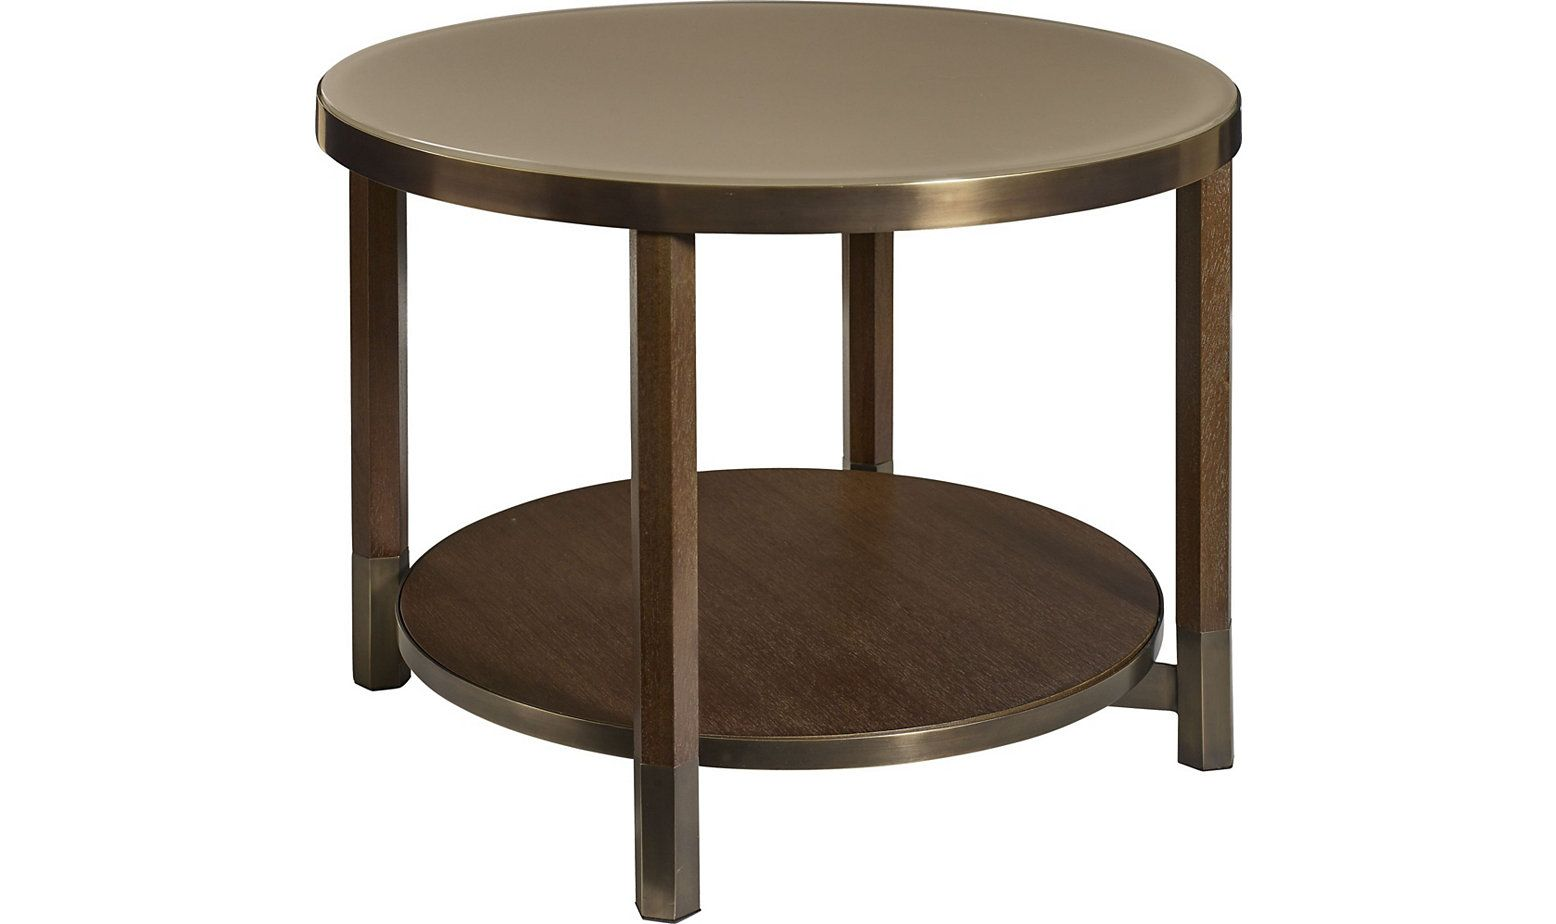 Spoke Lamp Table By Barbara Barry 3356 Baker Furniture Table Table Lamp Baker Furniture [ 924 x 1556 Pixel ]